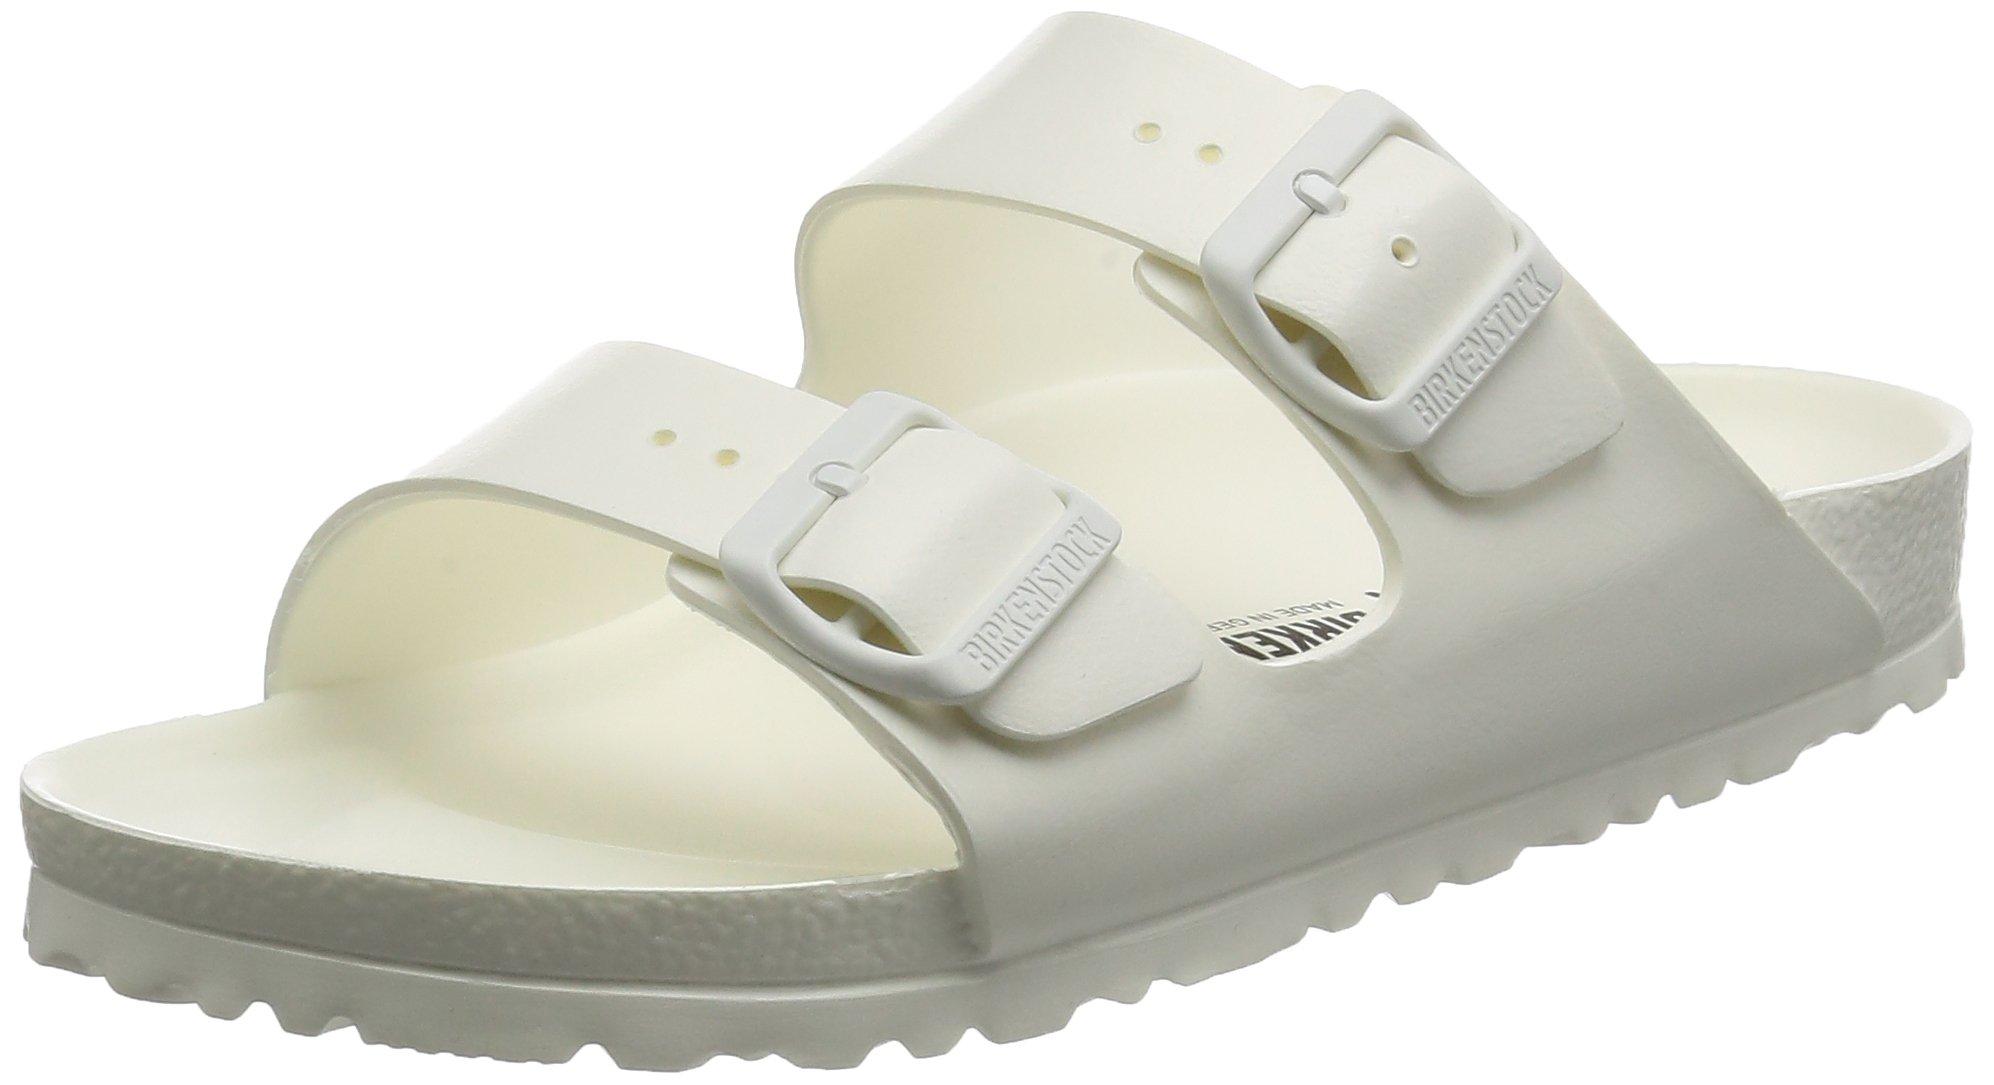 Birkenstock Unisex Arizona Essentials EVA White Sandals - 38 N EU